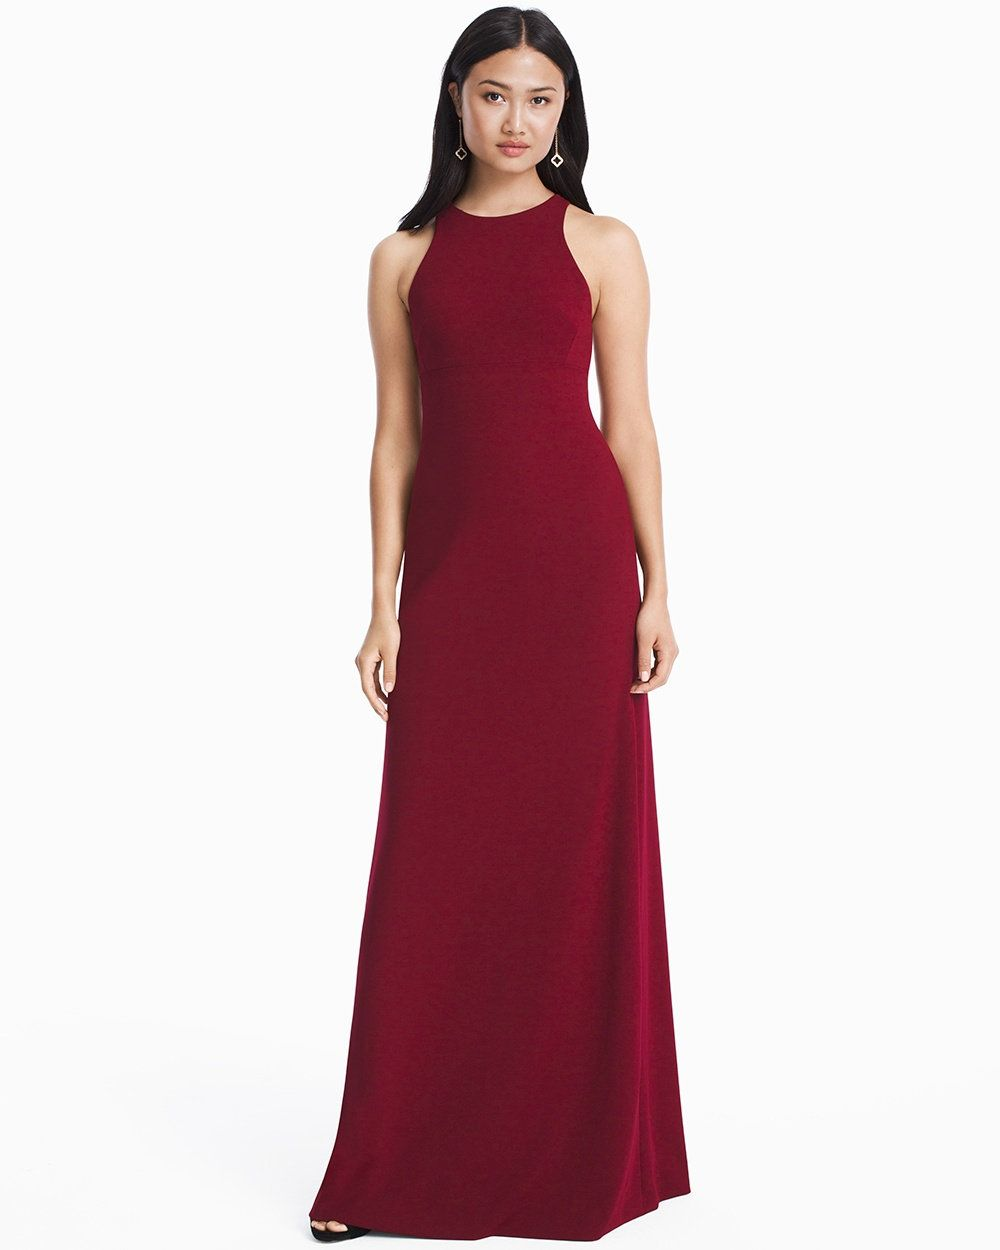 Xback back gown whbm designer dresses fashion pinterest